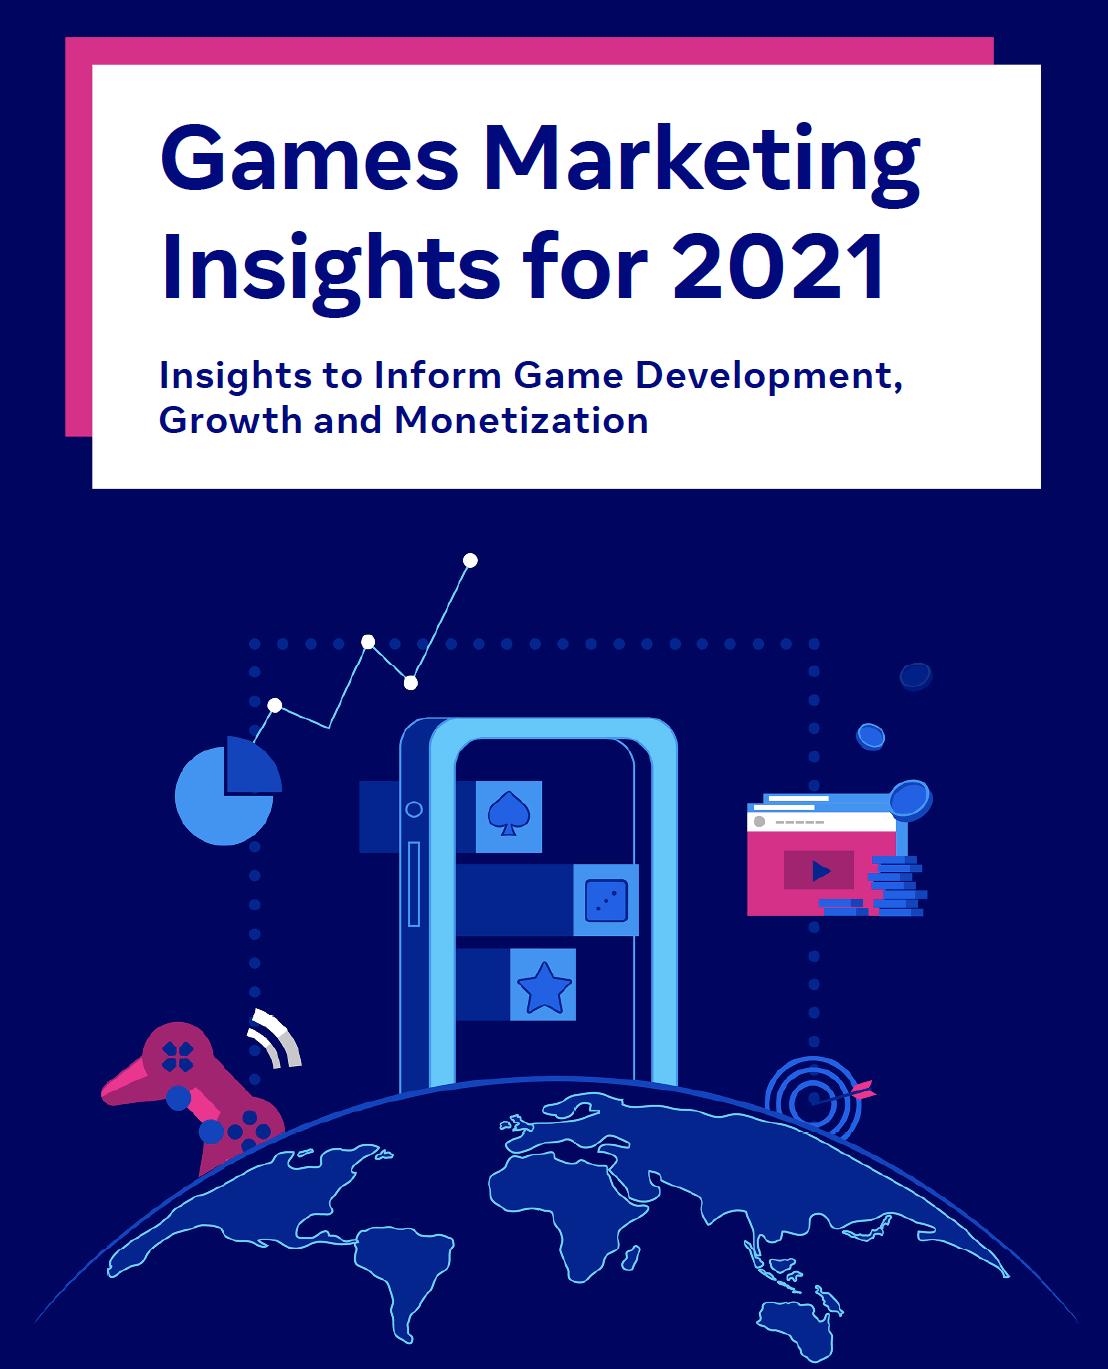 Gaming marketing insights report